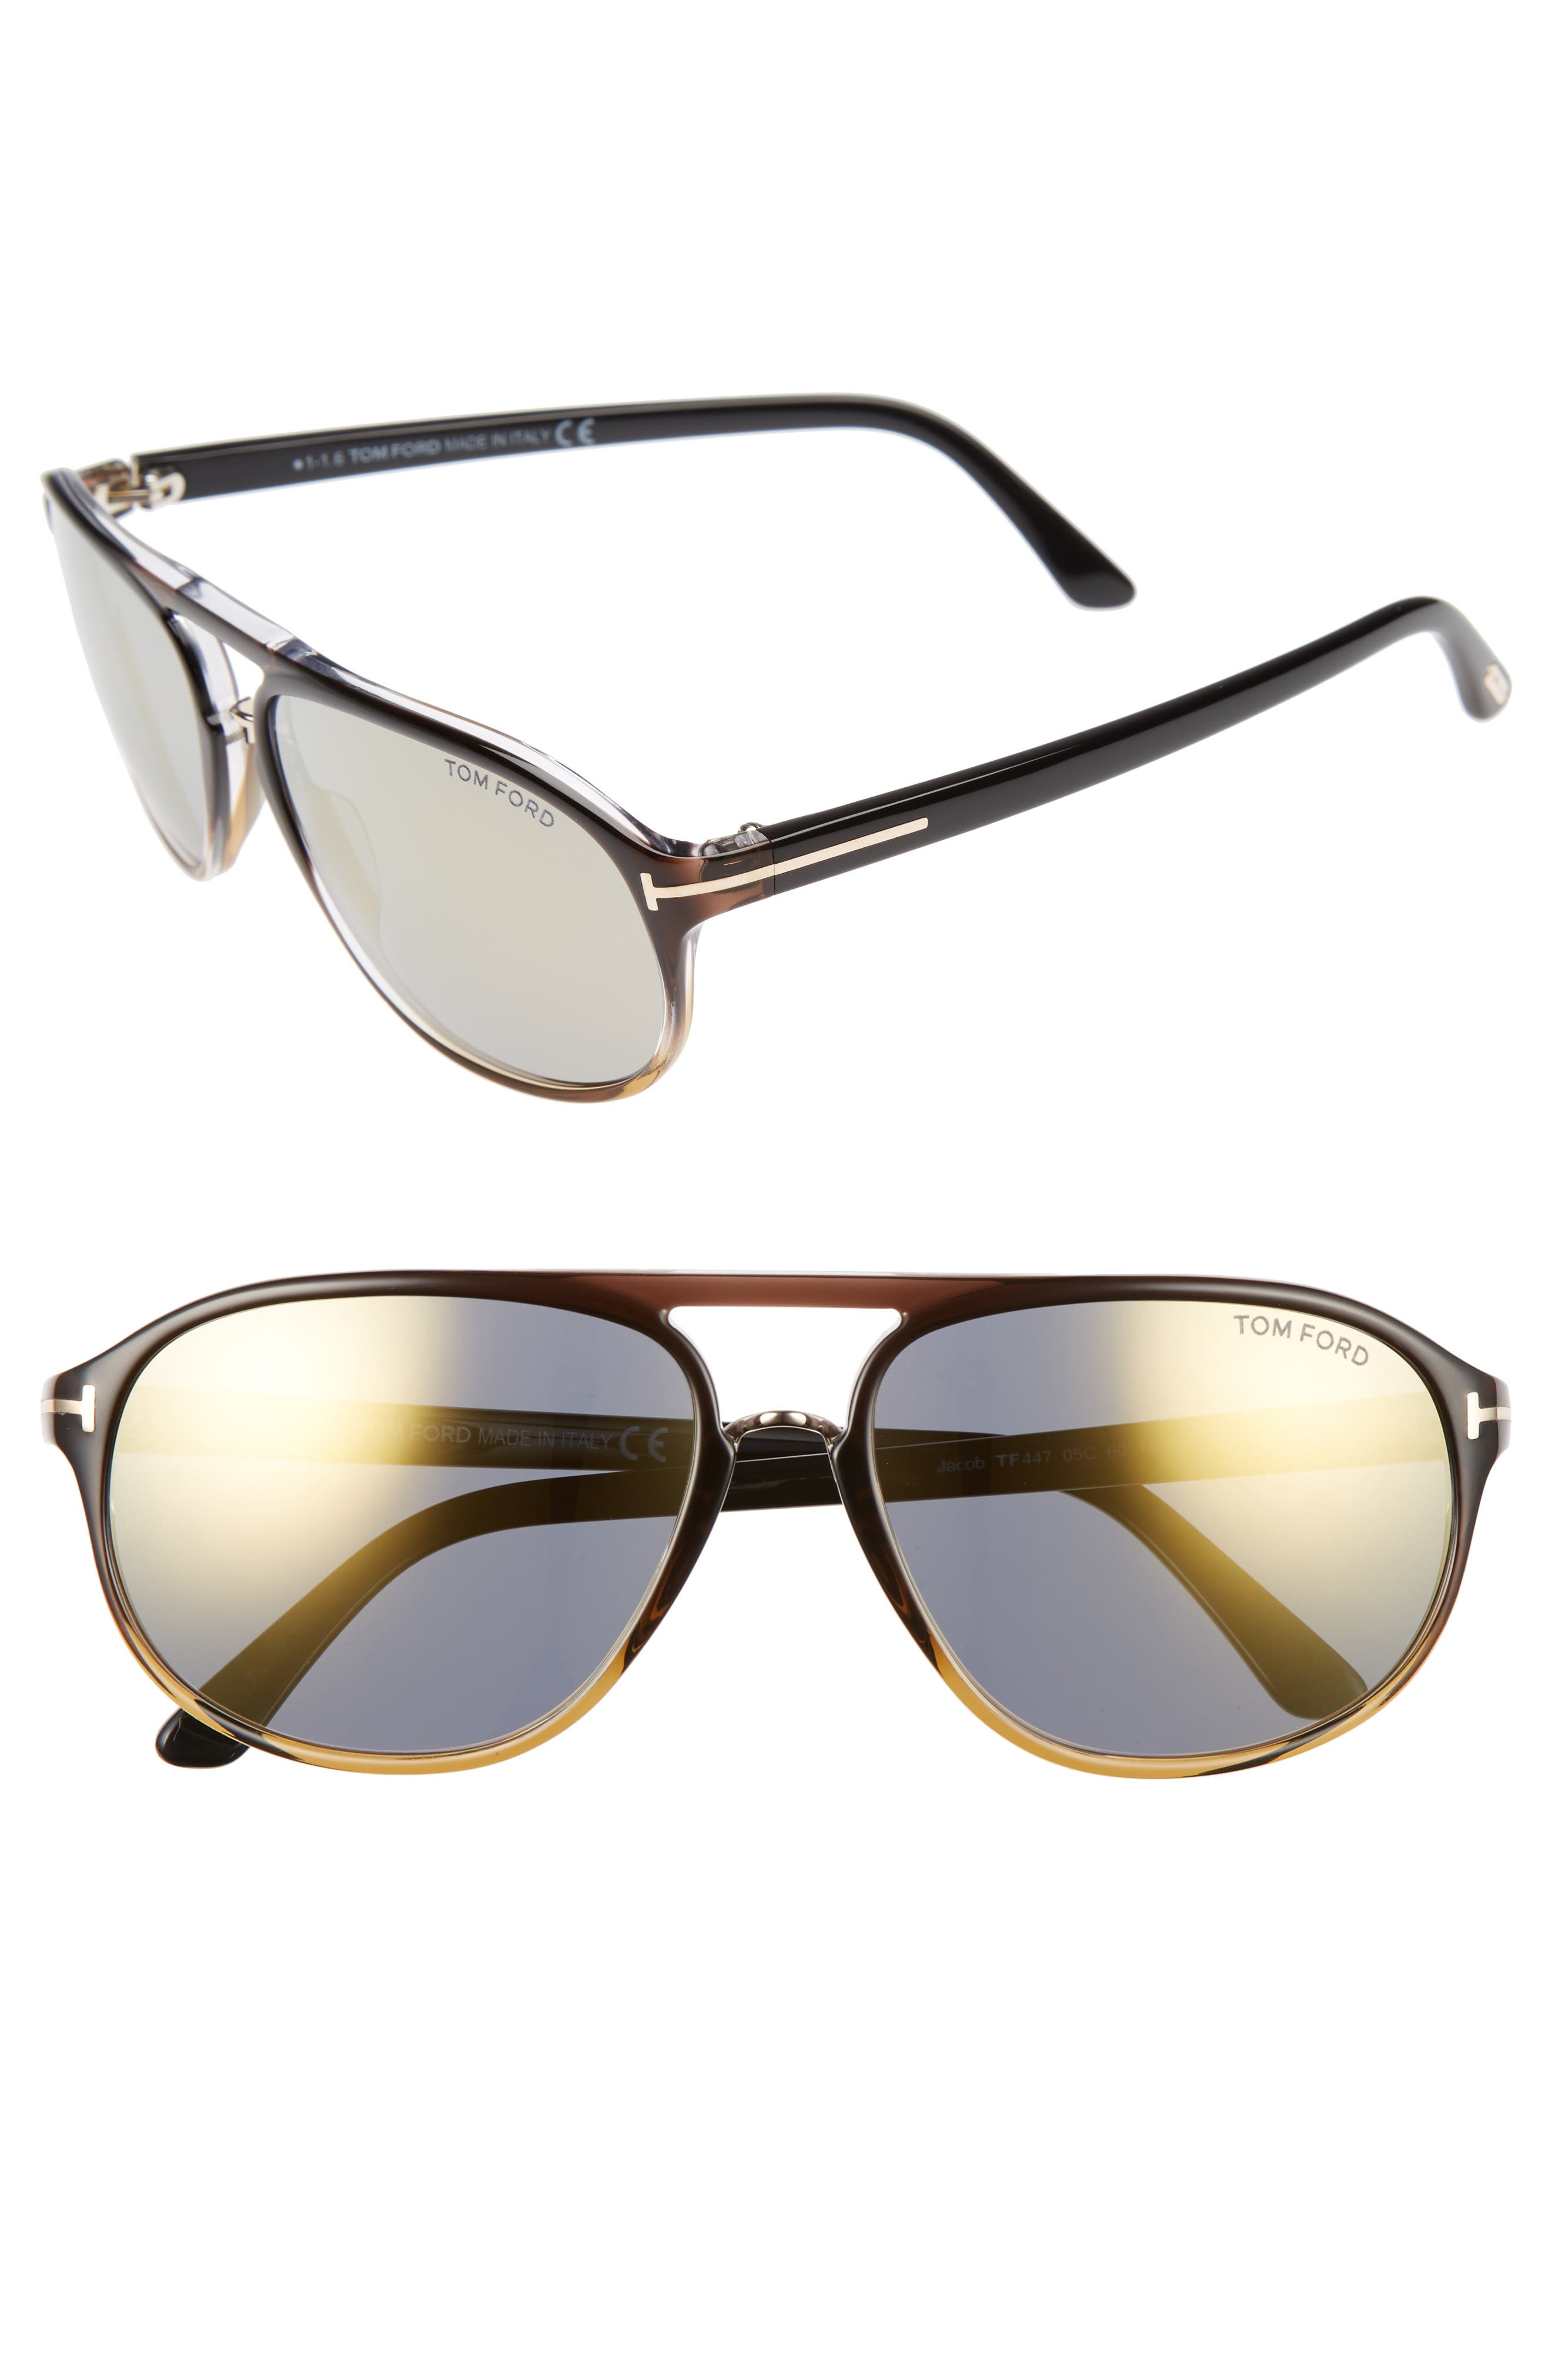 Jacob 60mm Retro Sunglasses,                         Main,                         color, Black/ Other/ Smoke Mirror